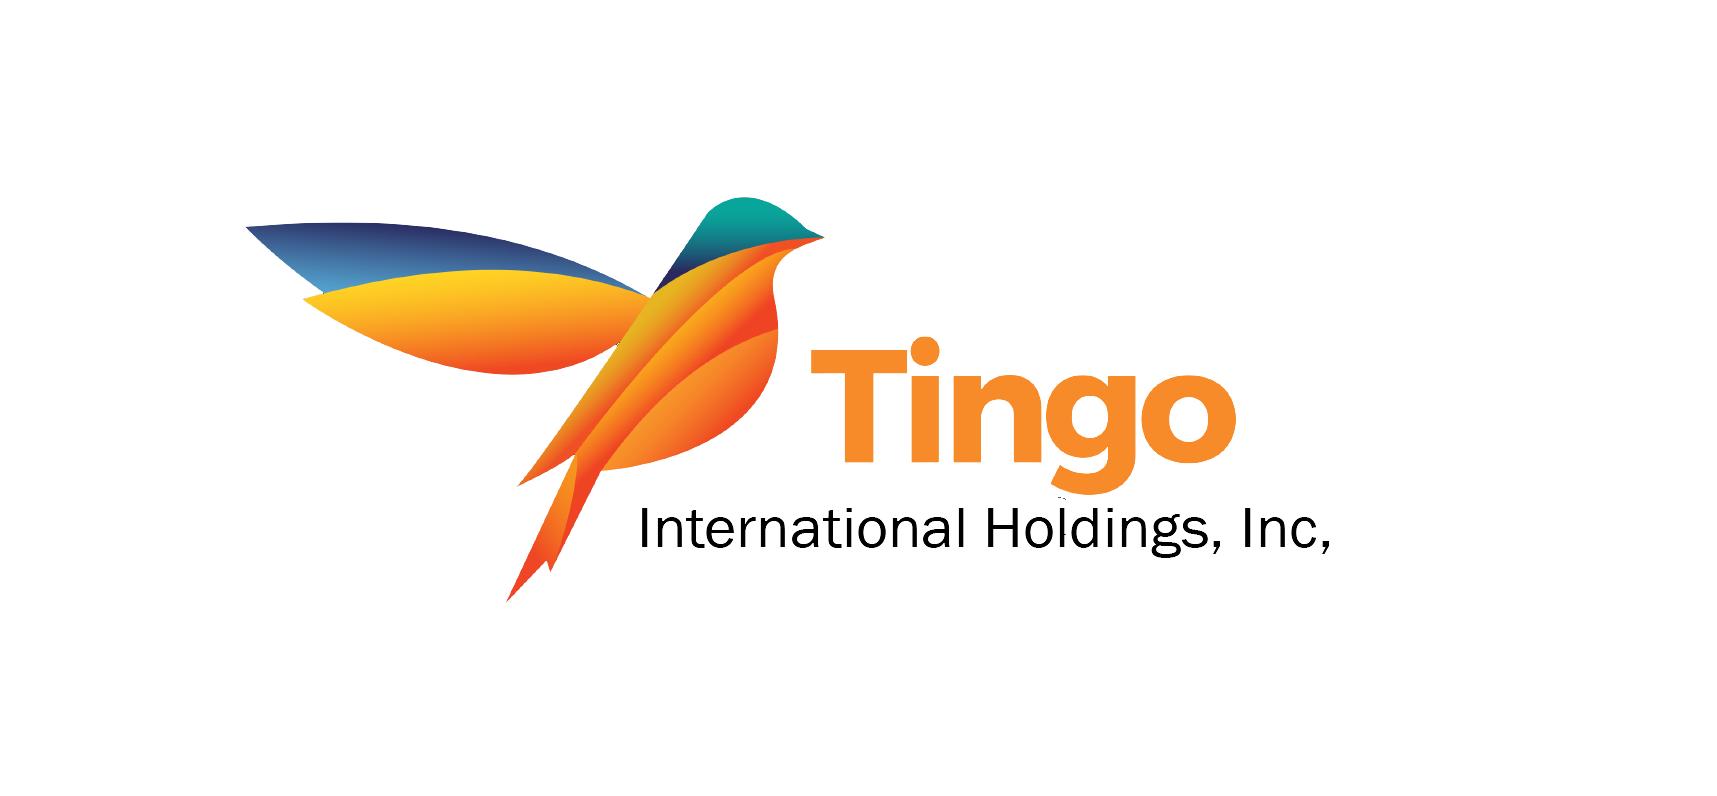 Tingo Inc. Nominated in Environmental, Social & Governance Category at Upcoming Crypto AM Awards